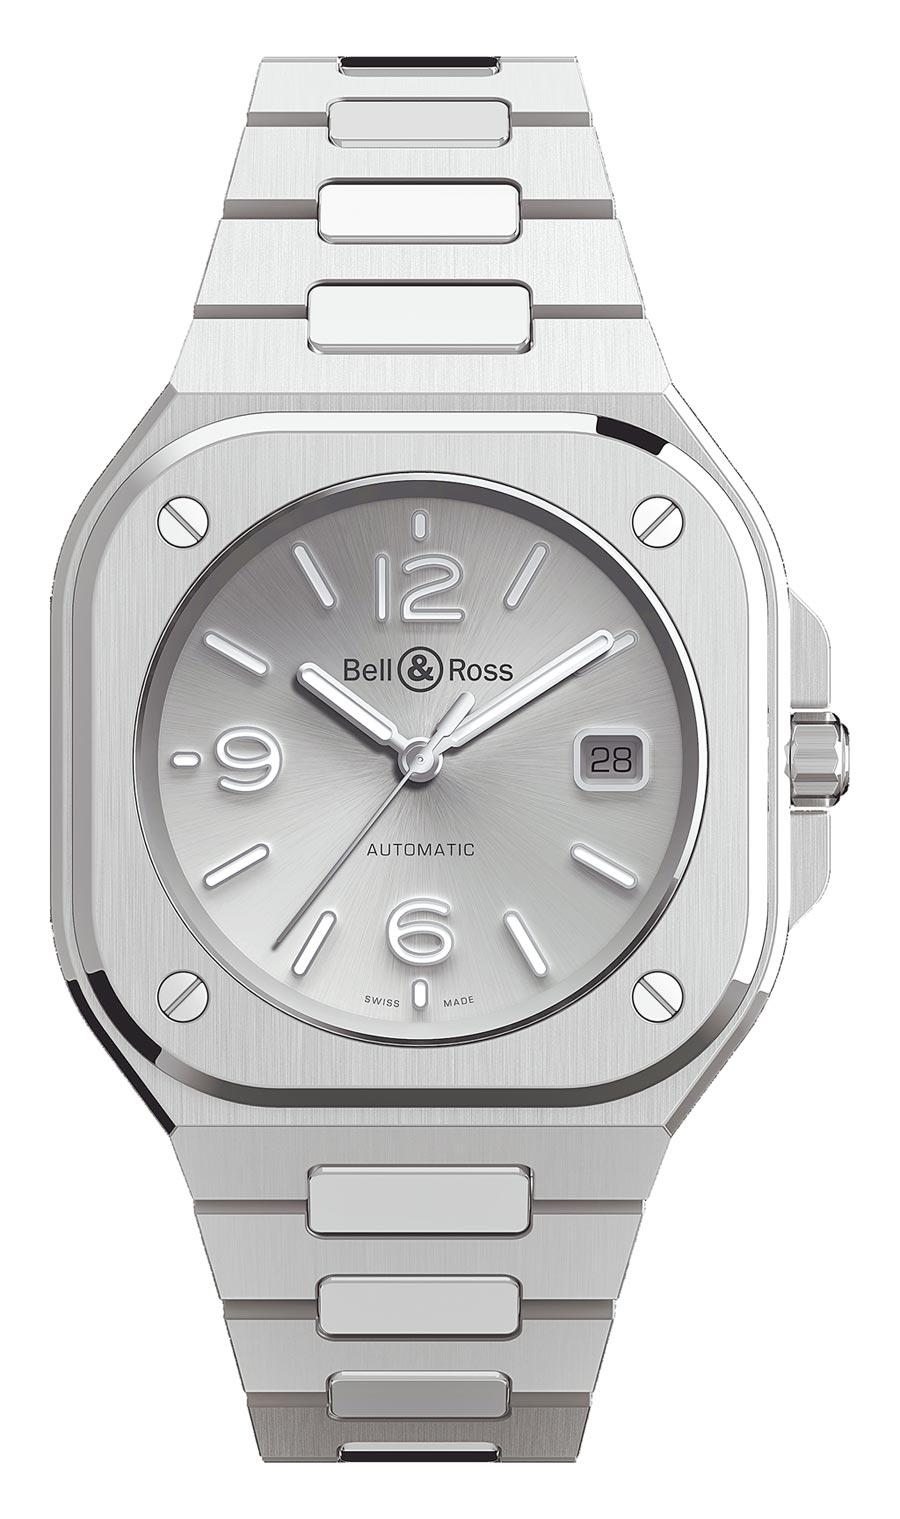 Bell & Ross年度力作BR05不鏽鋼灰色表盤腕表,16萬8000元。(Bell & Ross提供)